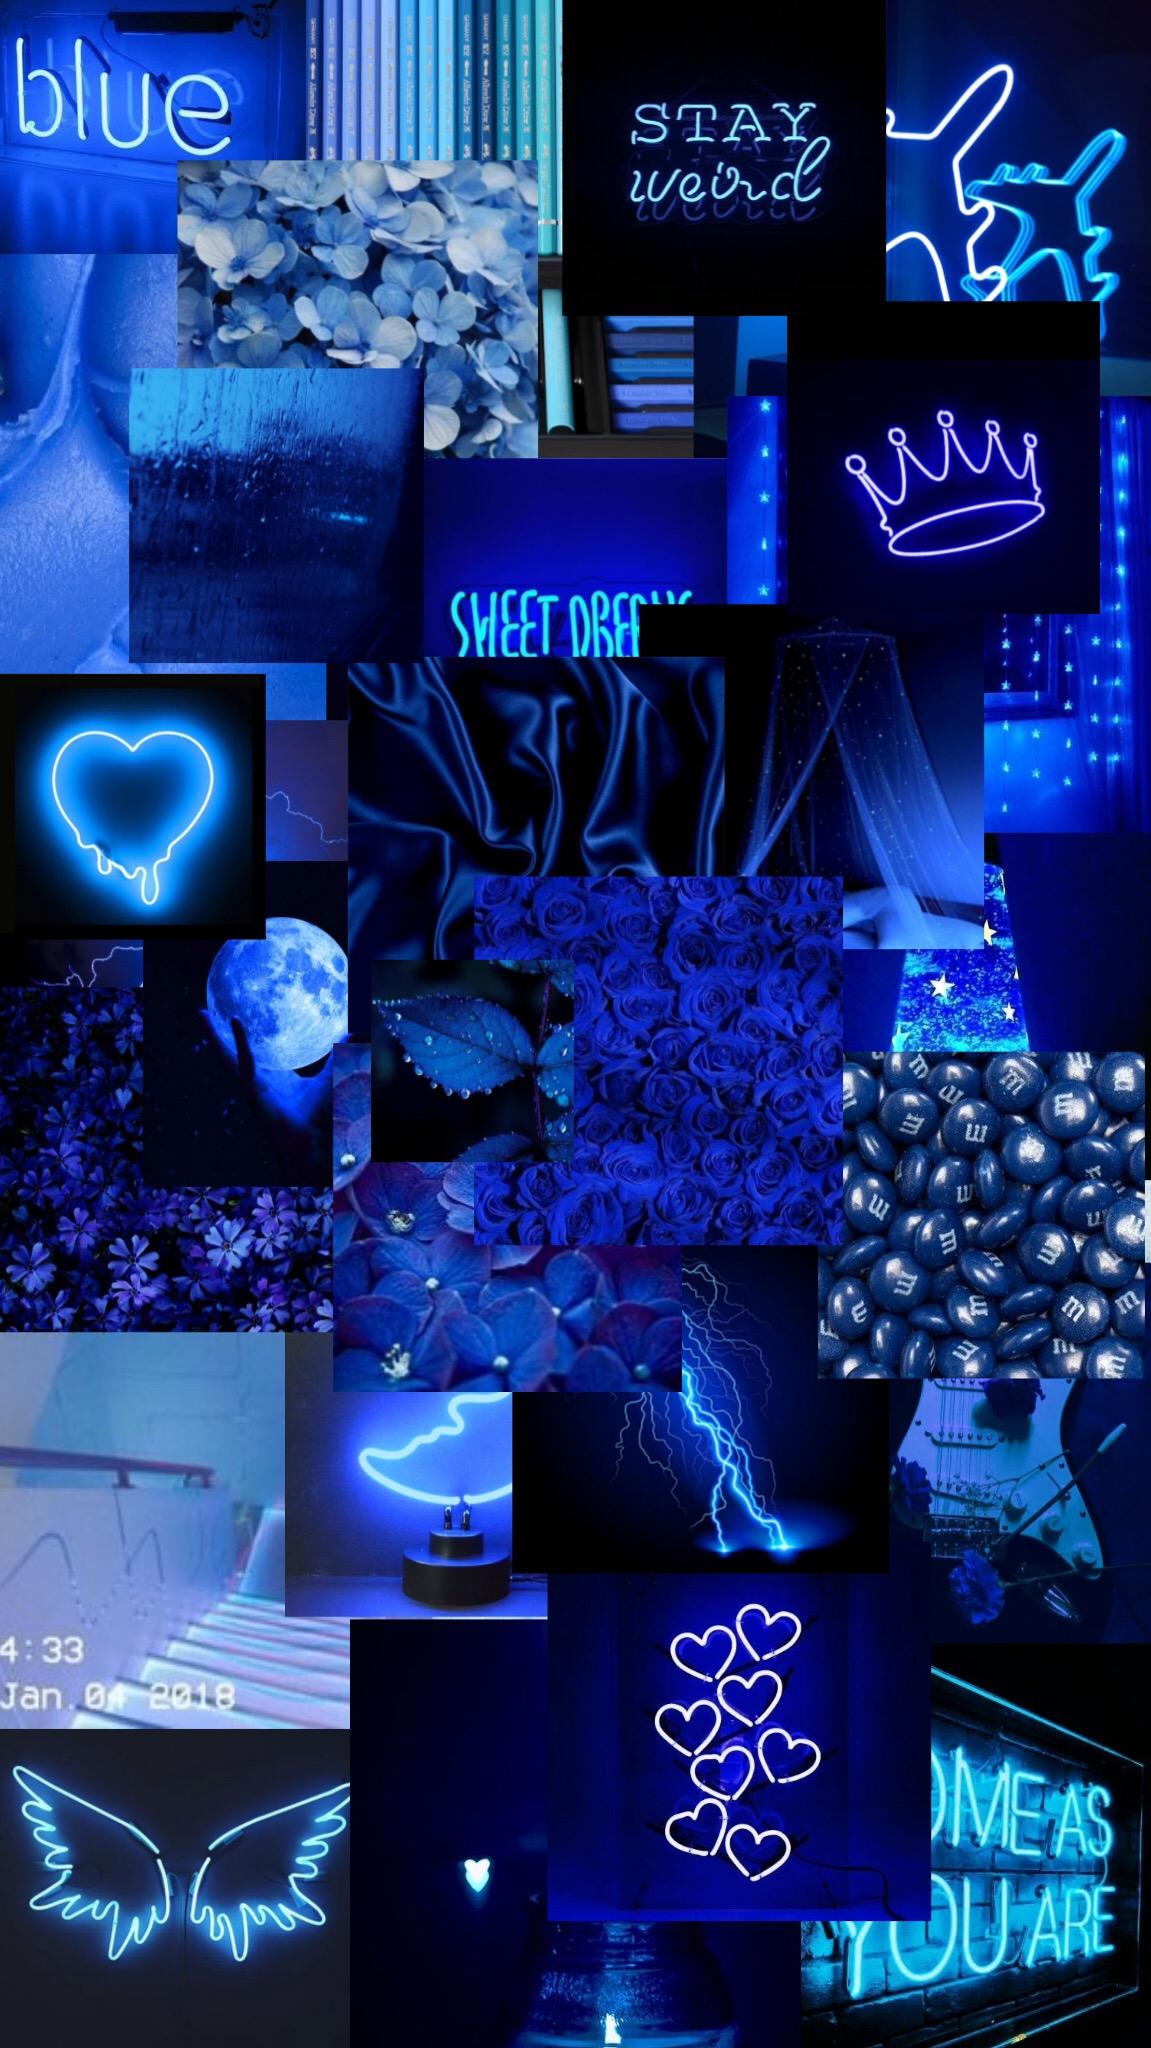 #wallpapers#edit#dark#blue#aesthetic#blackaesthetic# ...